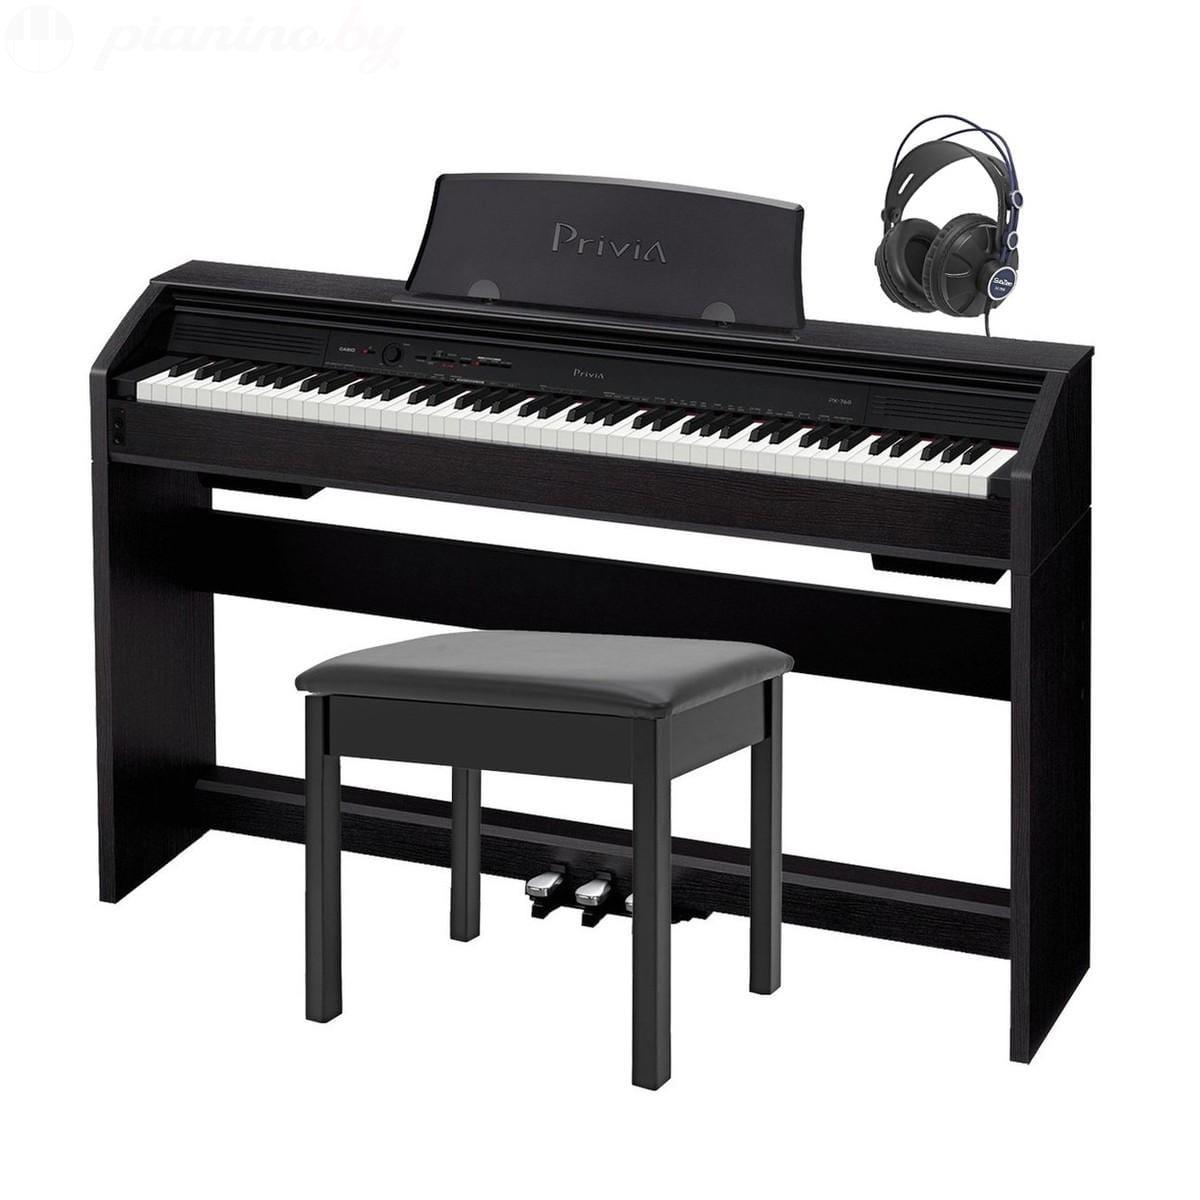 Цифровое пианино Casio PX-760 Black Фото 1